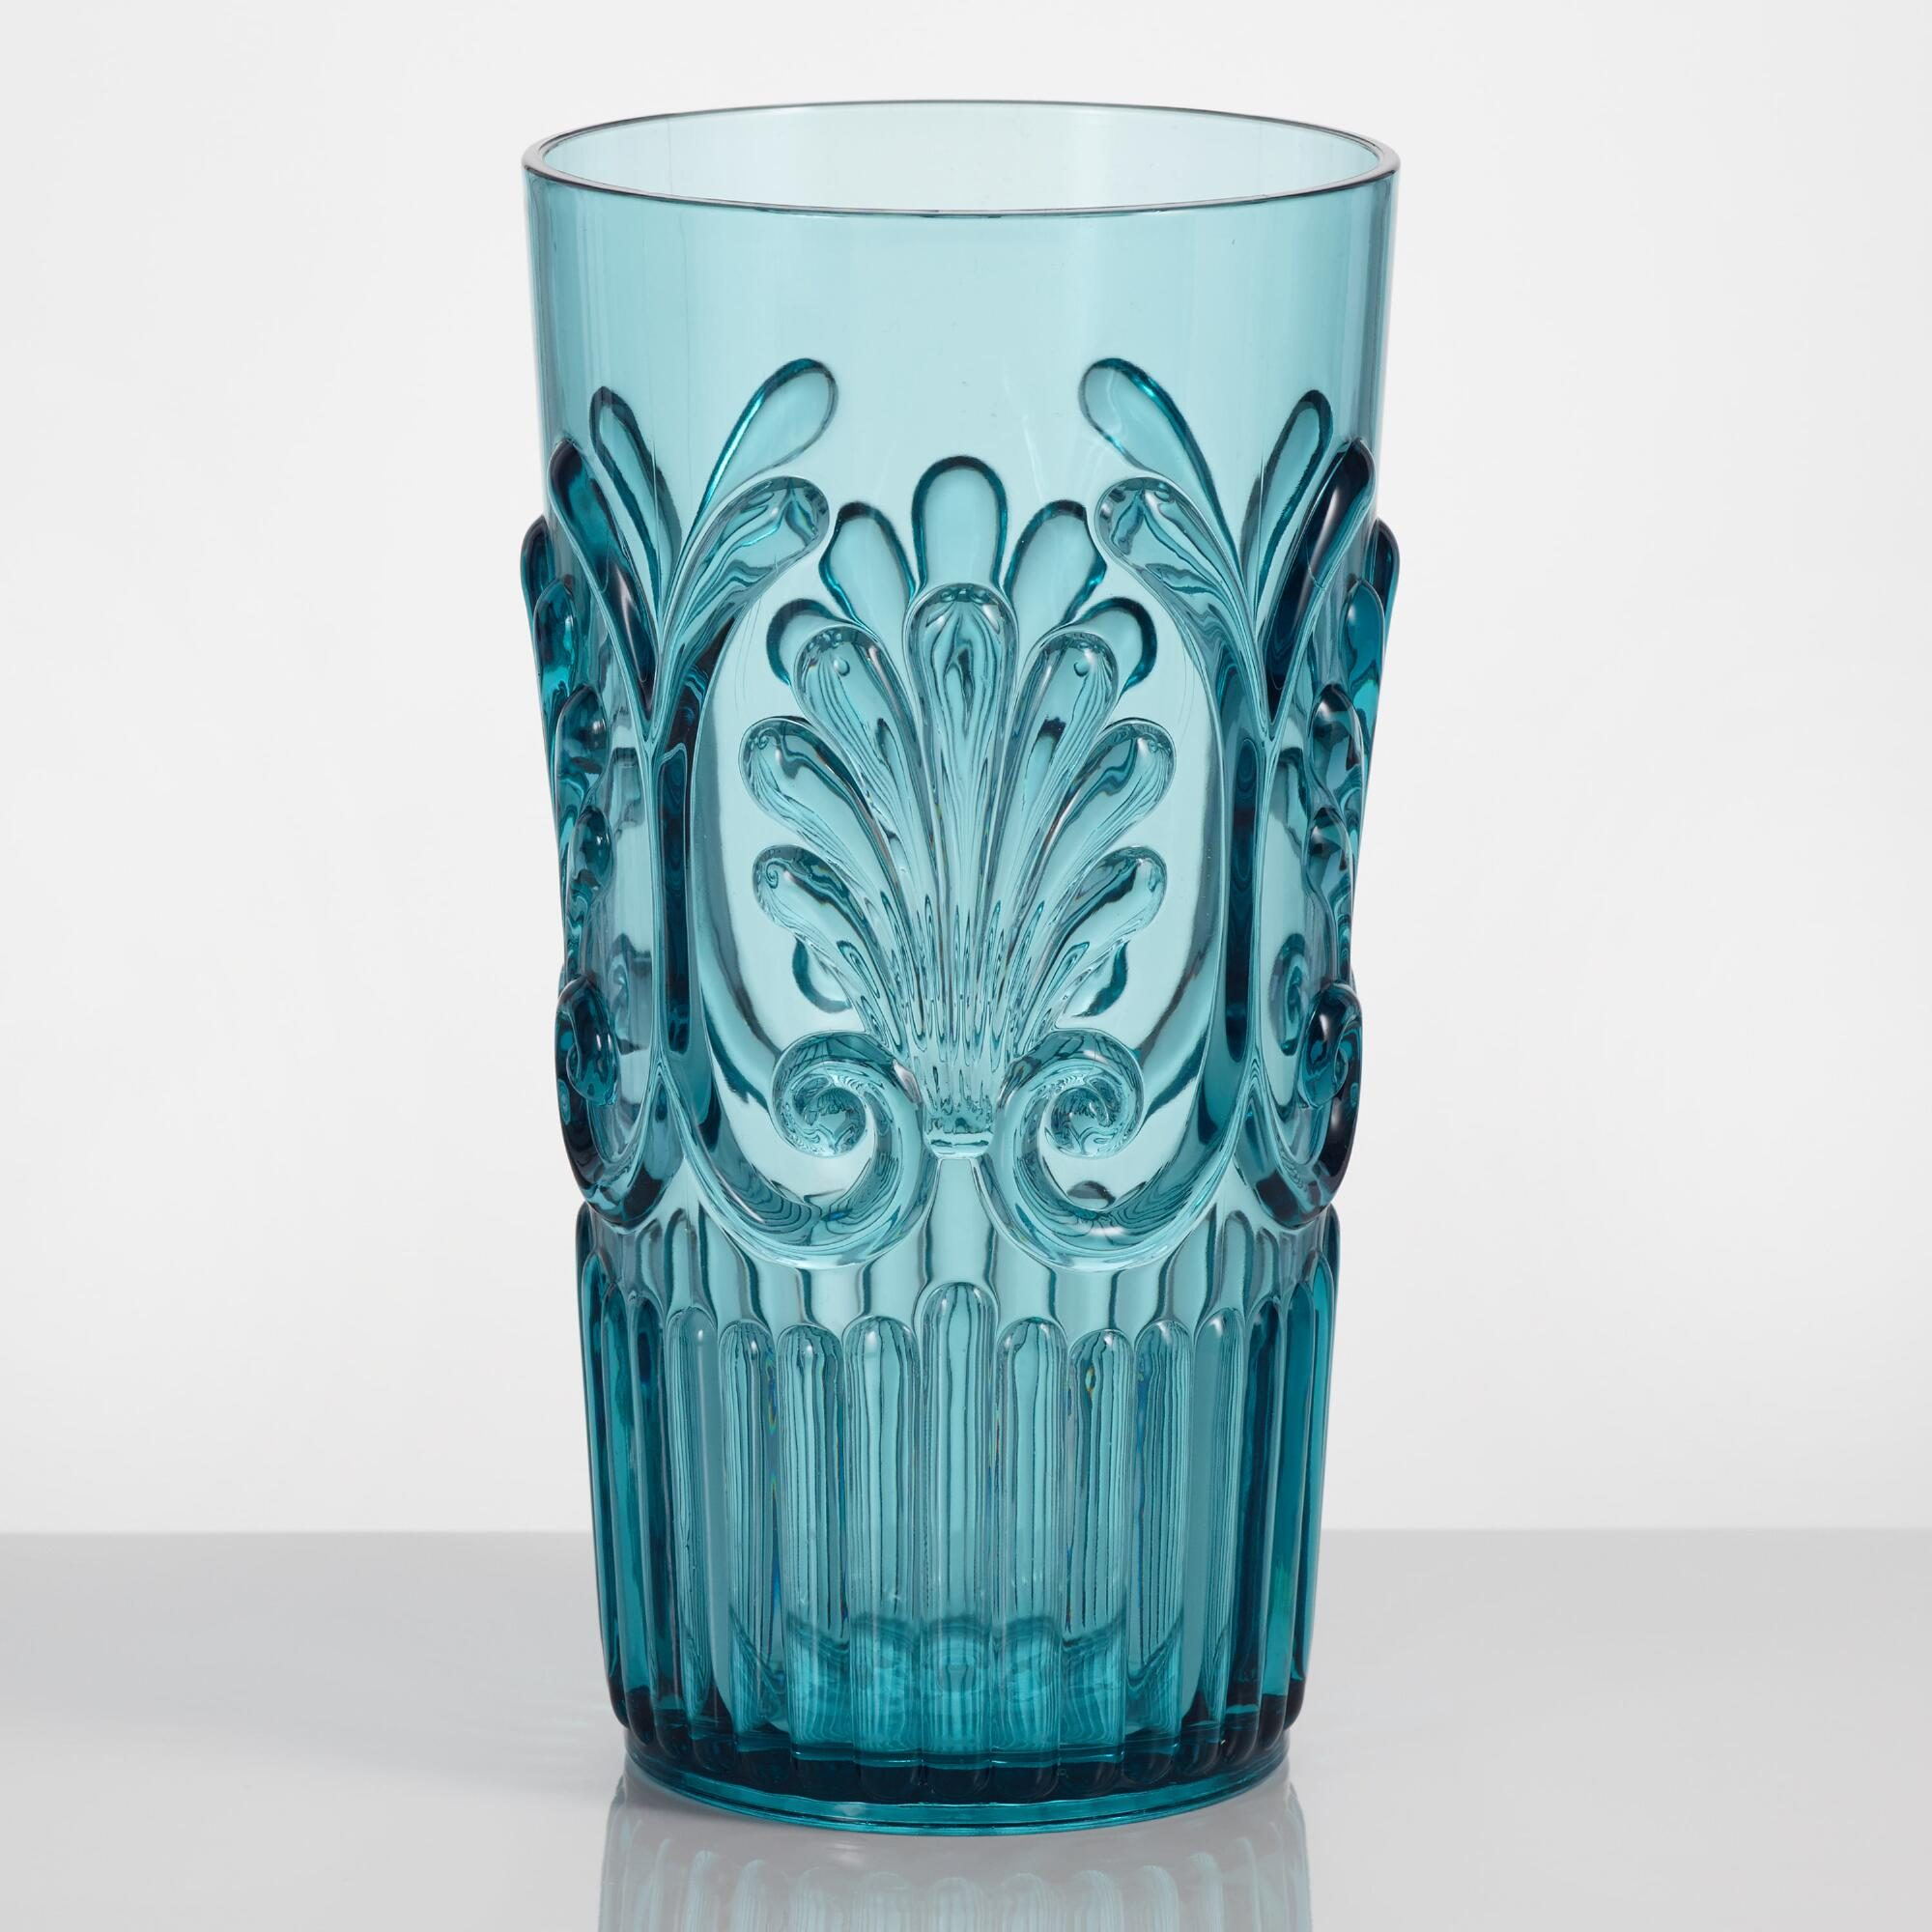 Aqua Pacific Acrylic Highball Glasses Set of 4: Blue/Green by World Market